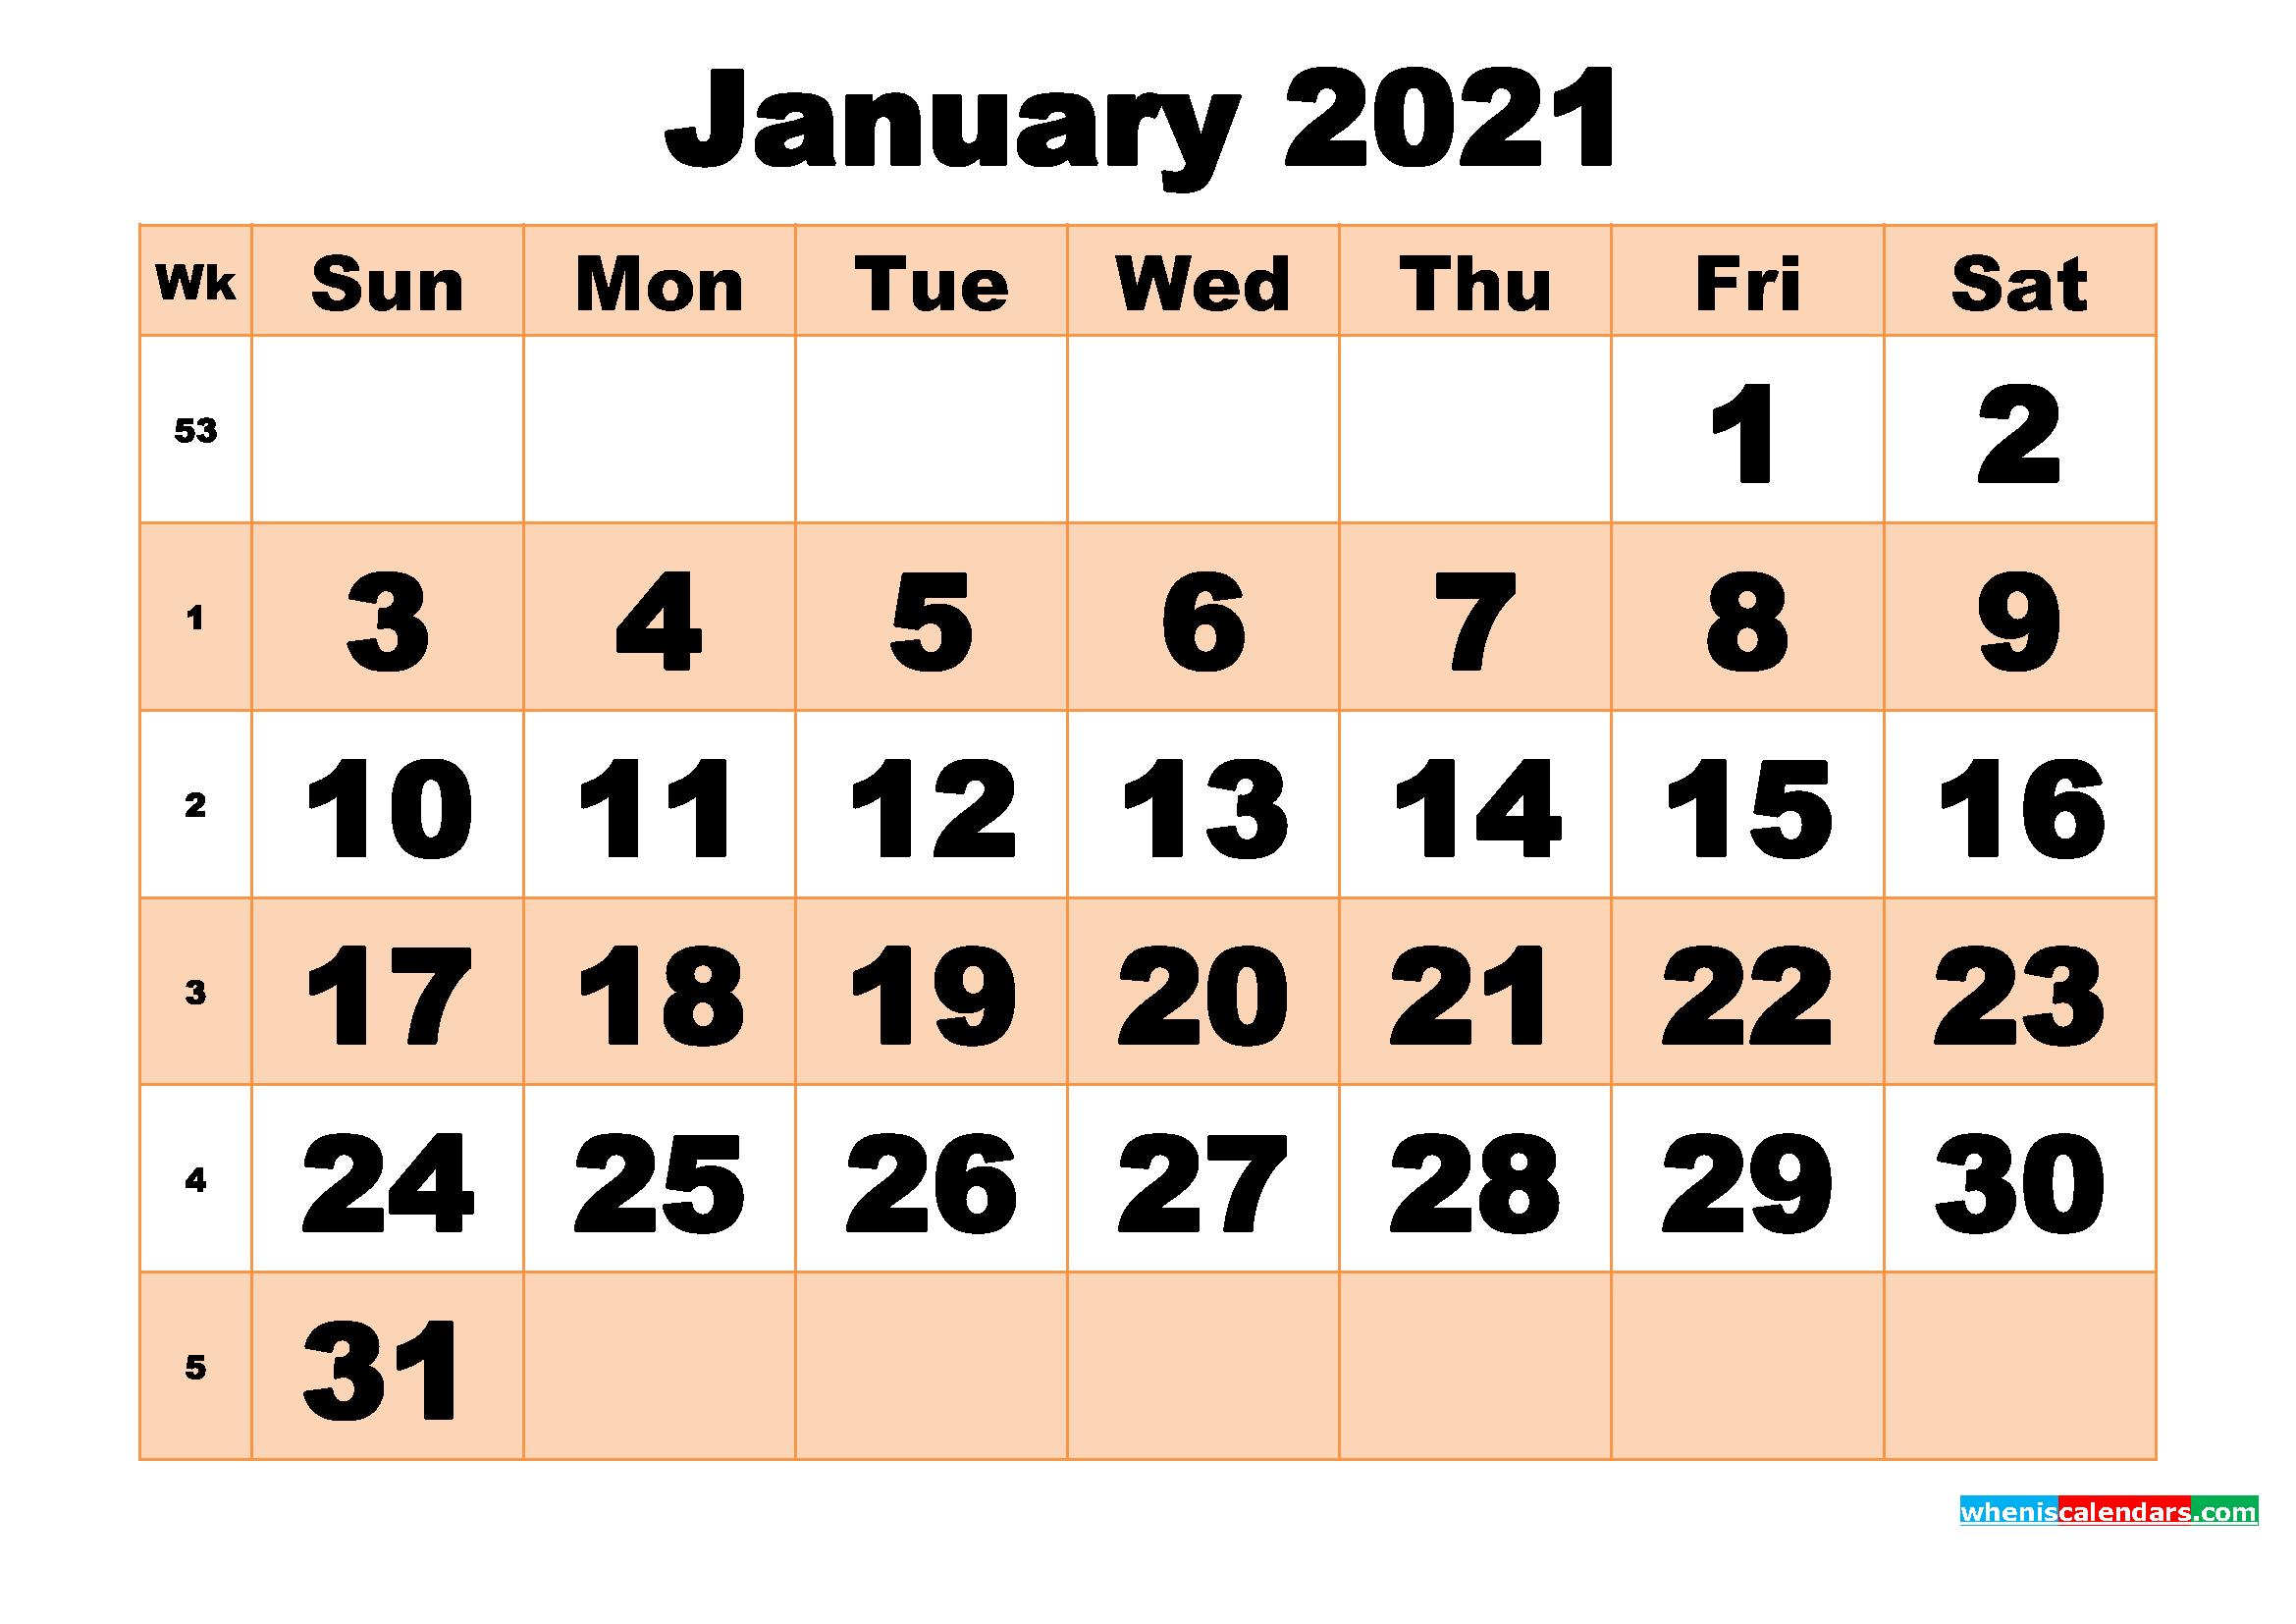 Free Printable January 2021 Calendar Template Word, Pdf  Word January 2021 Template